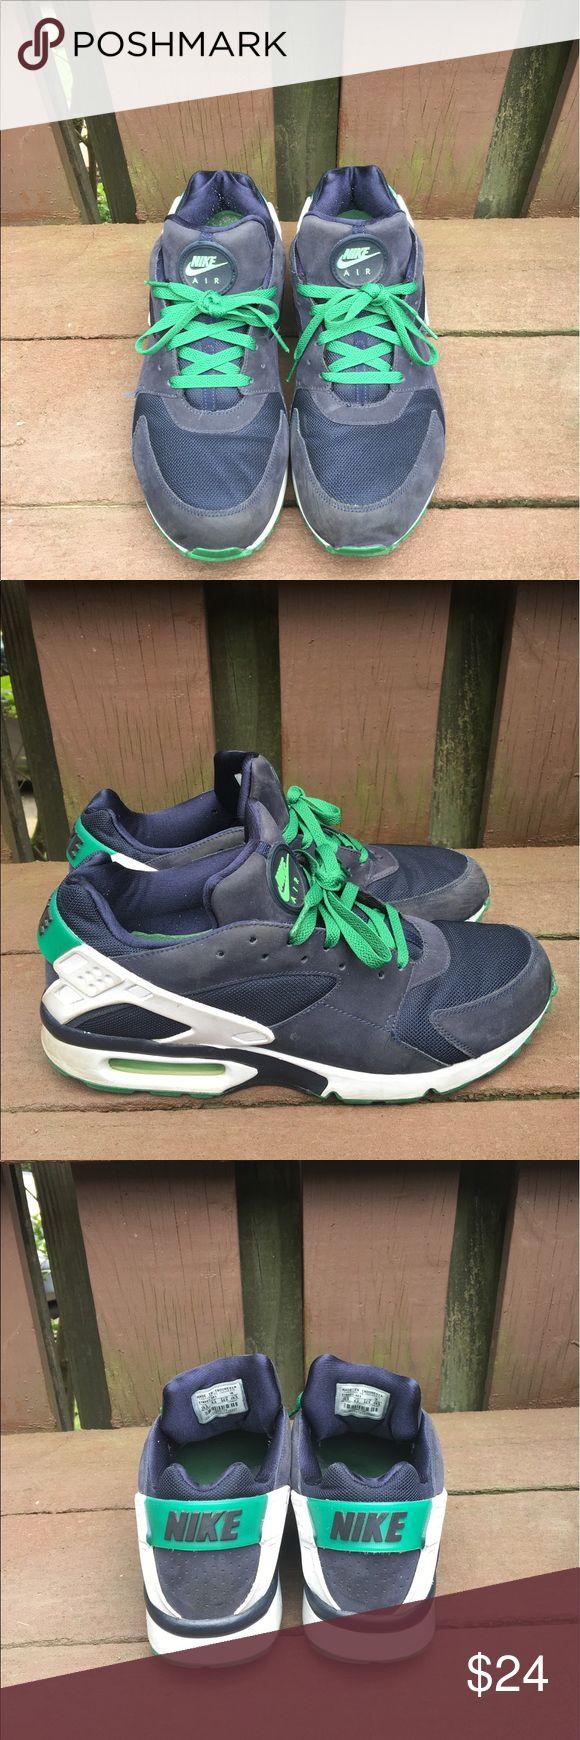 Nike Air Huarache ACG Sportswear 10.5 Sneakers Nike Air Huarache men's running sneakers 10.5 Navy Blue with Green Laces. Very rare sneaker Nike Air Shoes Sneakers